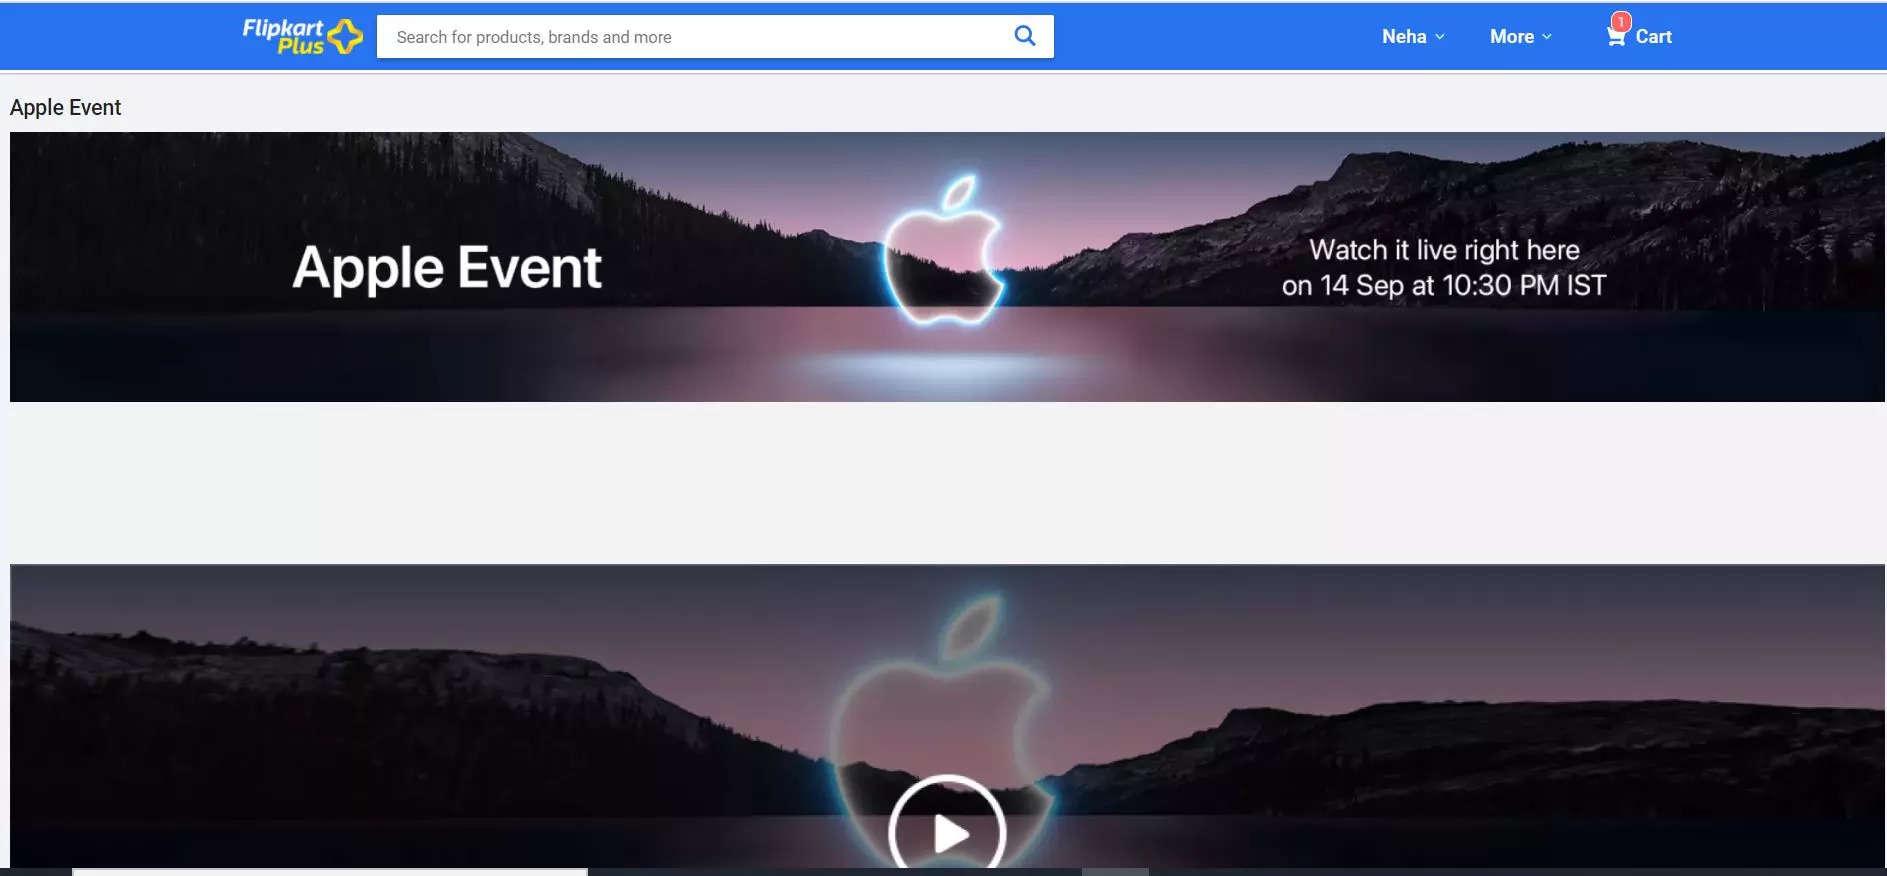 Apple iPhone 13 launch event to telecast on Flipkart